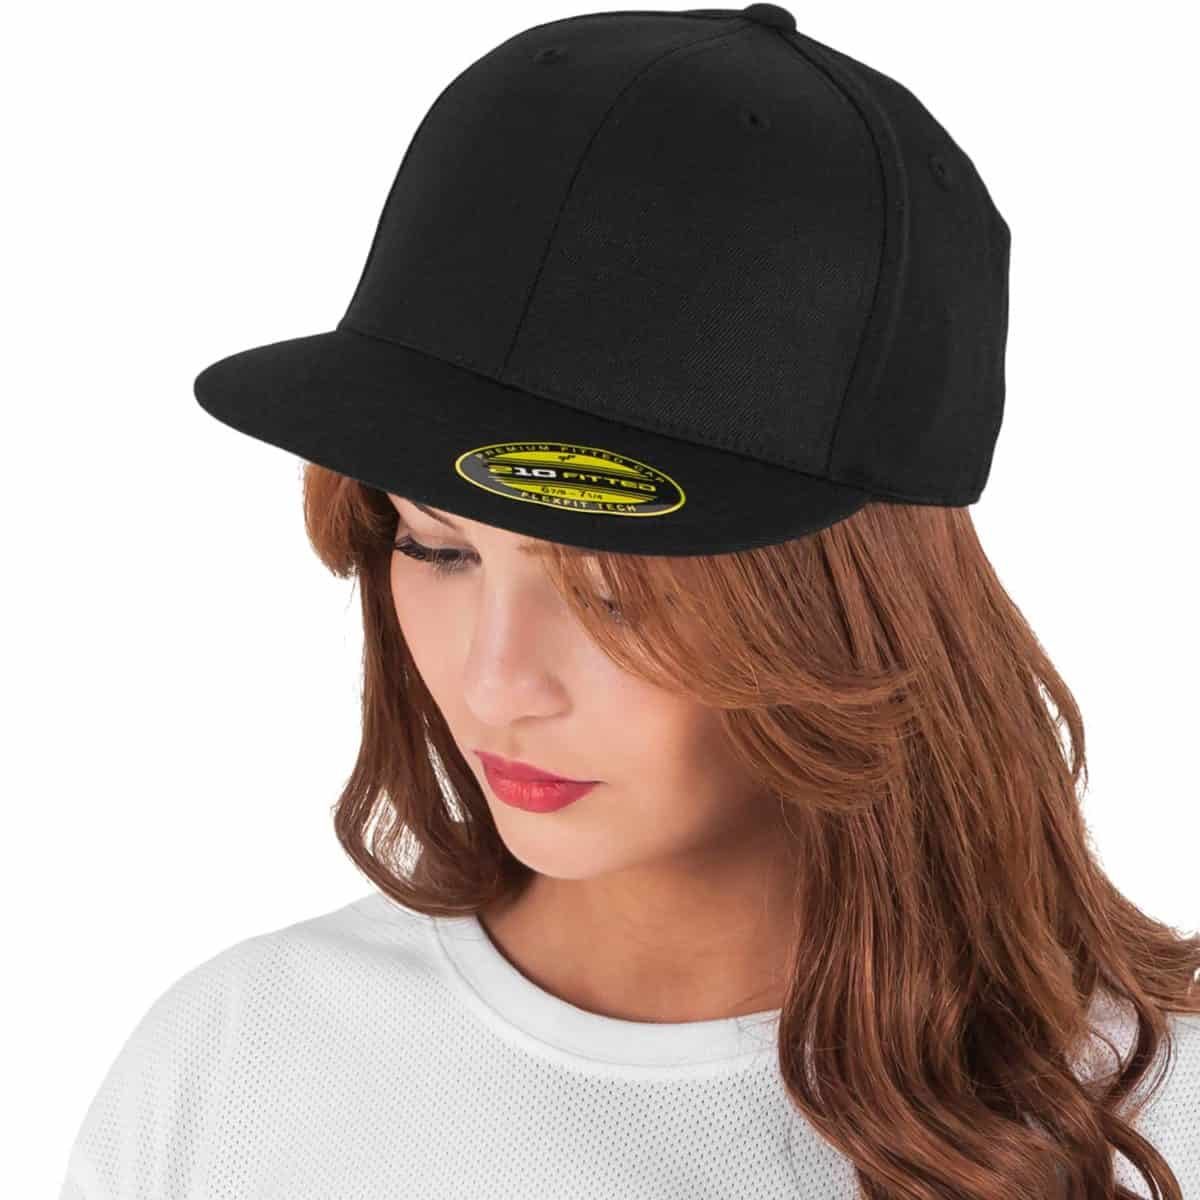 Flexfit FlexfitCaps FFE 6210 Black Model W